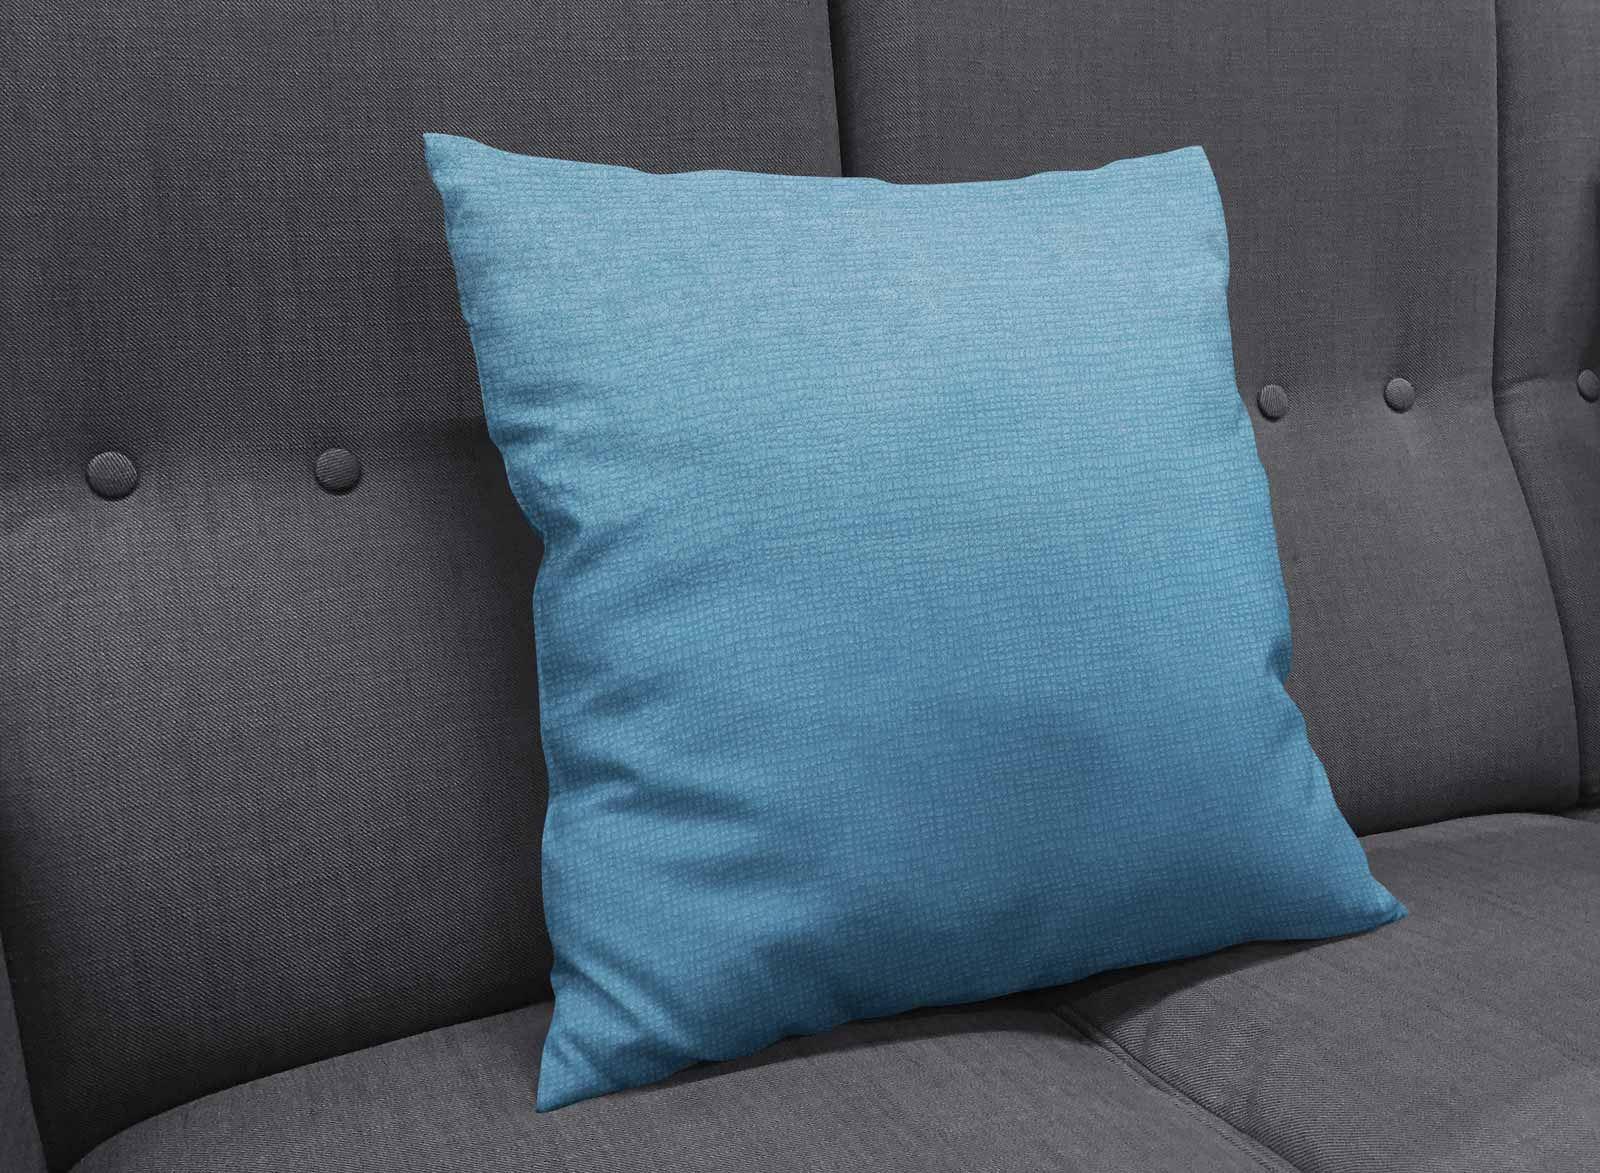 Teal-Blue-Duck-Egg-Cushion-Covers-18-034-x18-034-45cm-x-45cm-Luxury-Cover thumbnail 19